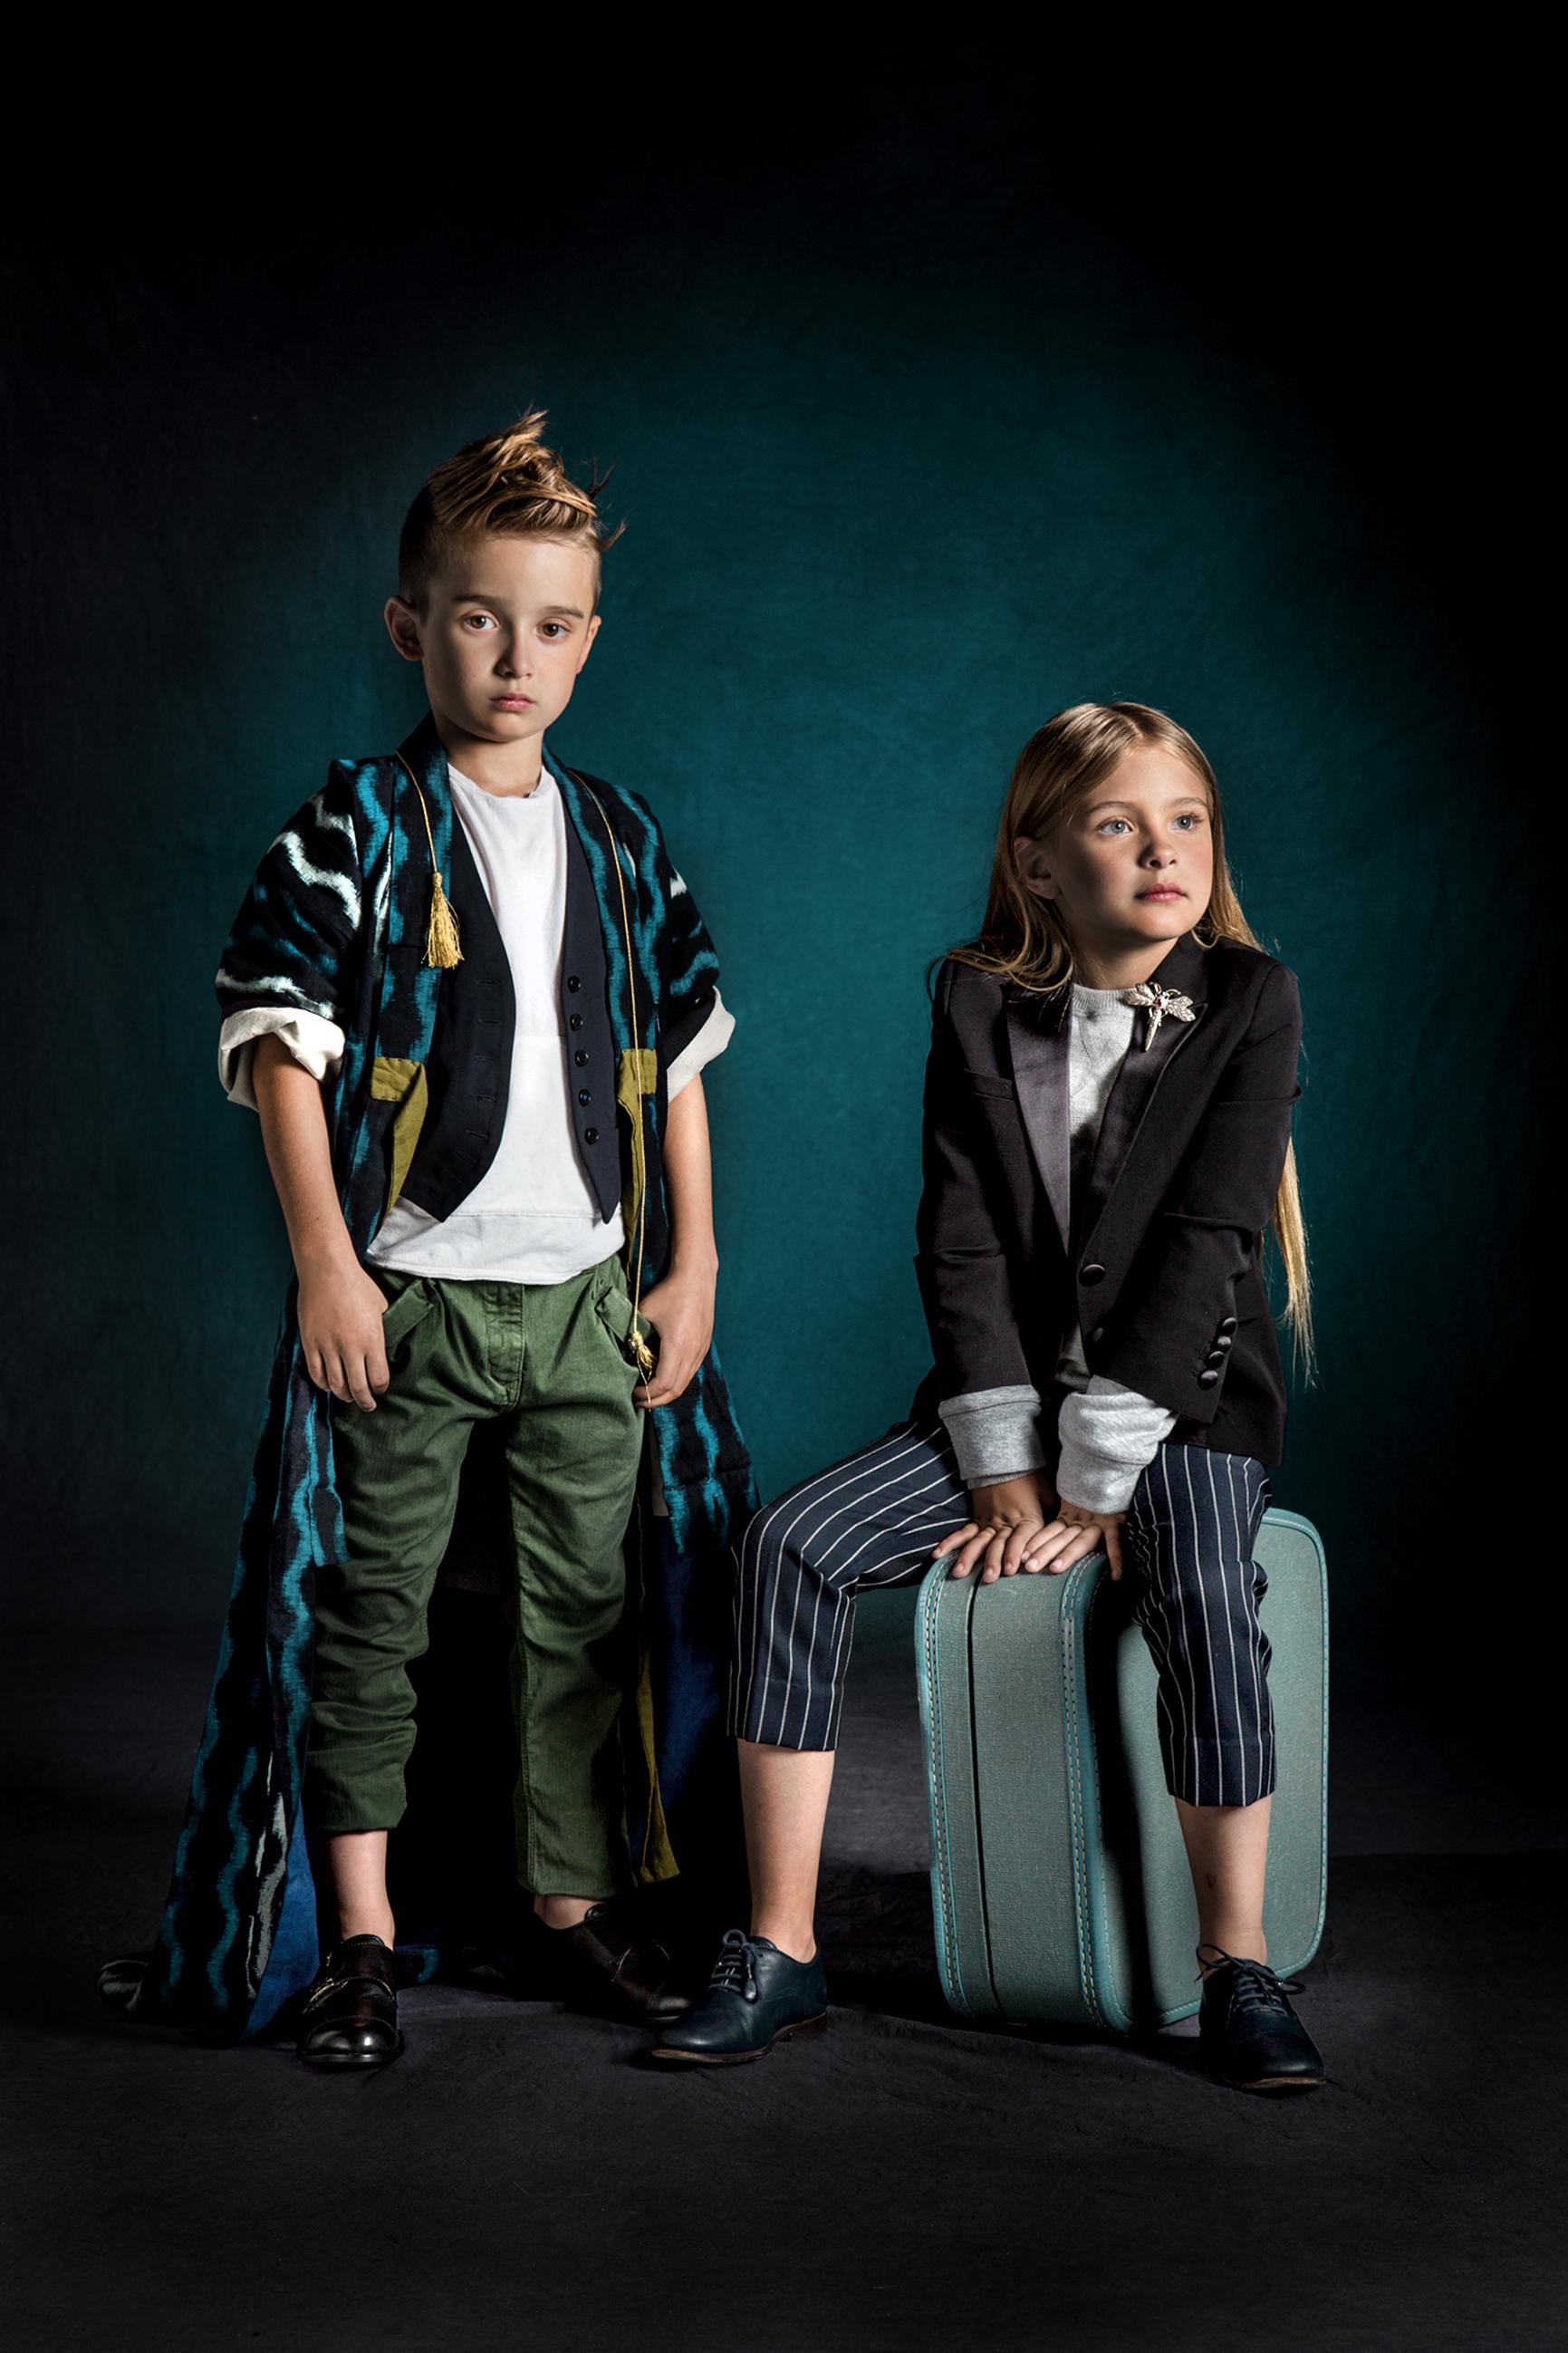 alonso_mateo_kids_fashion_felicidad_de_lucas_photographer_002.jpg